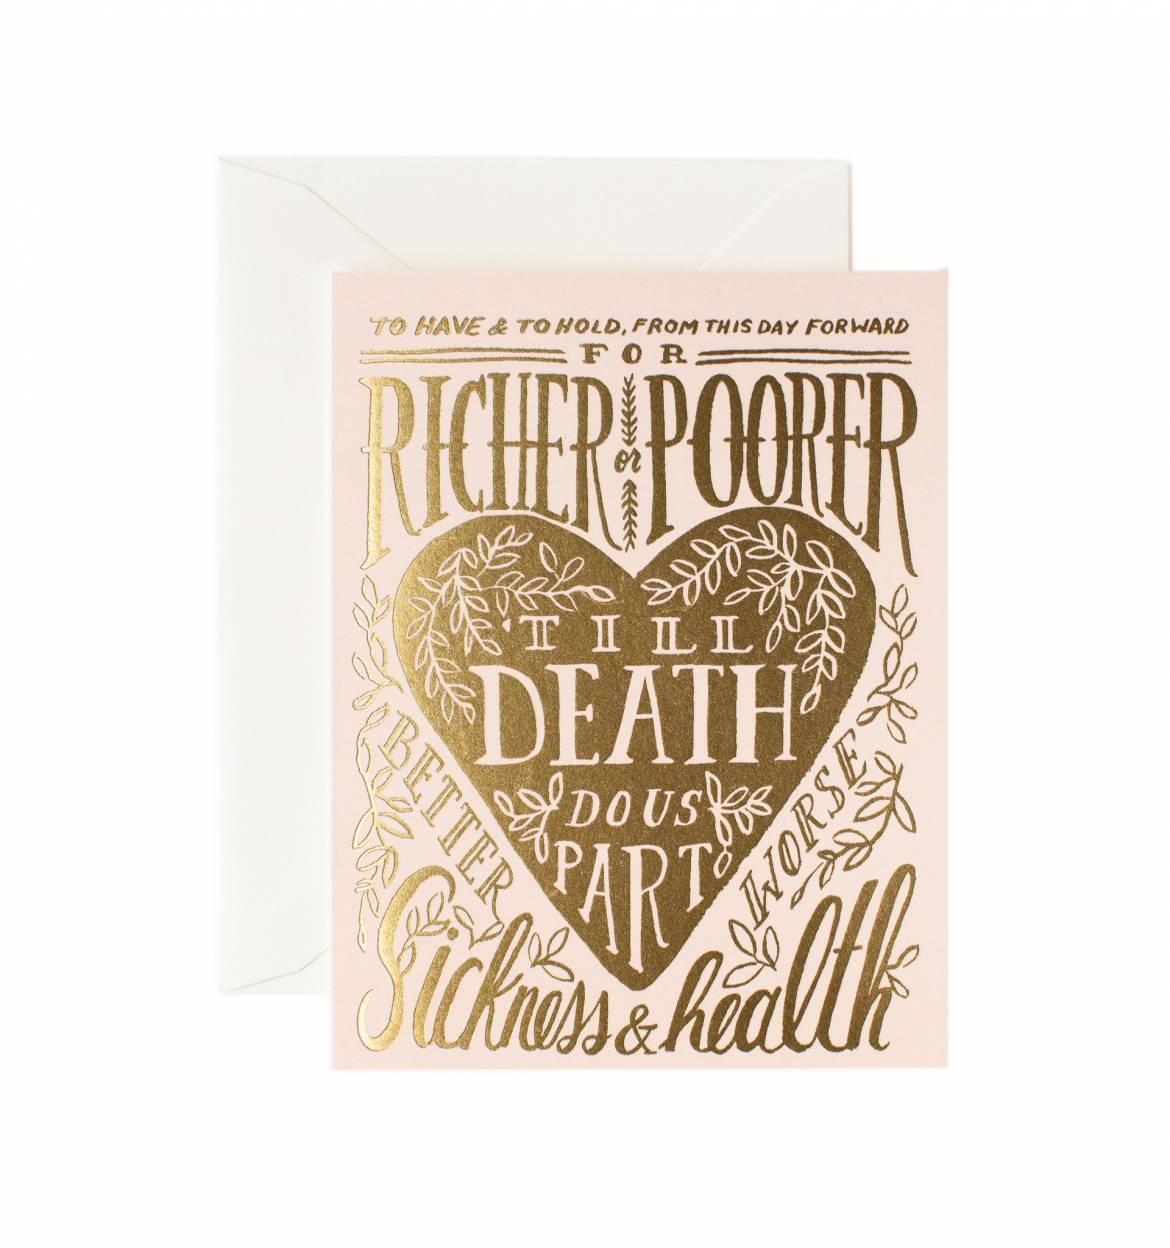 till-death-do-us-part-greeting-card-01.jpg